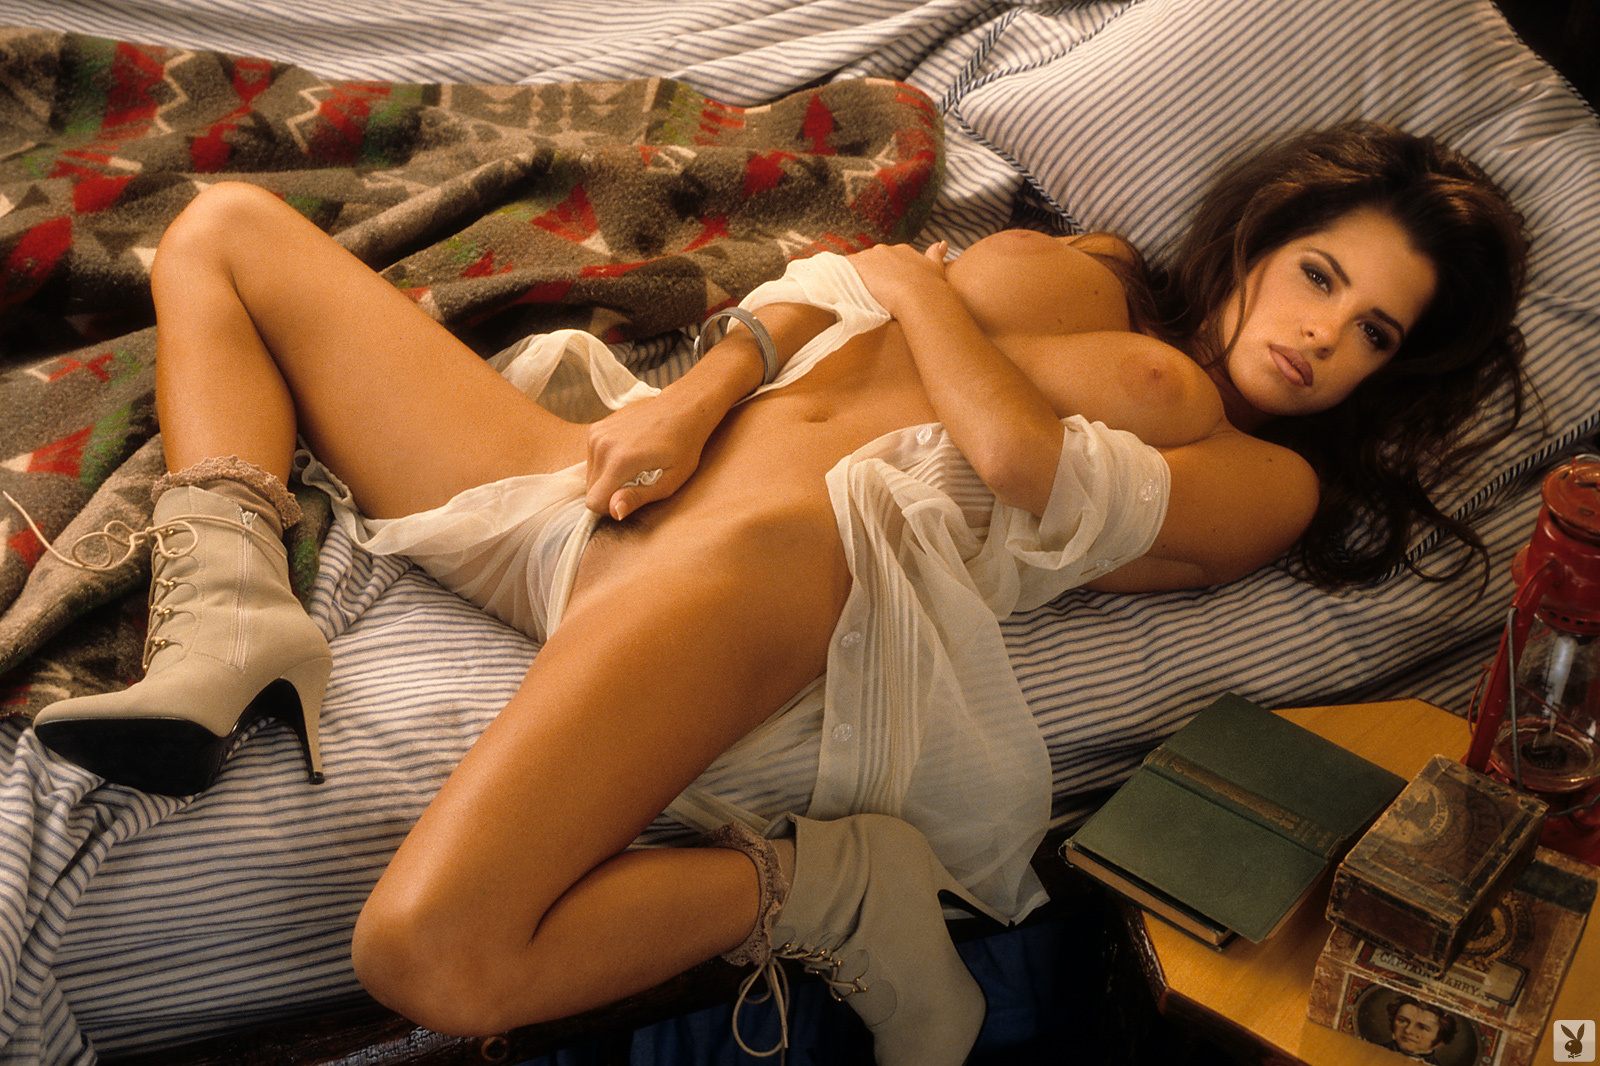 kelly-monaco-boobs-naked-playmate-april-1997-playboy-39